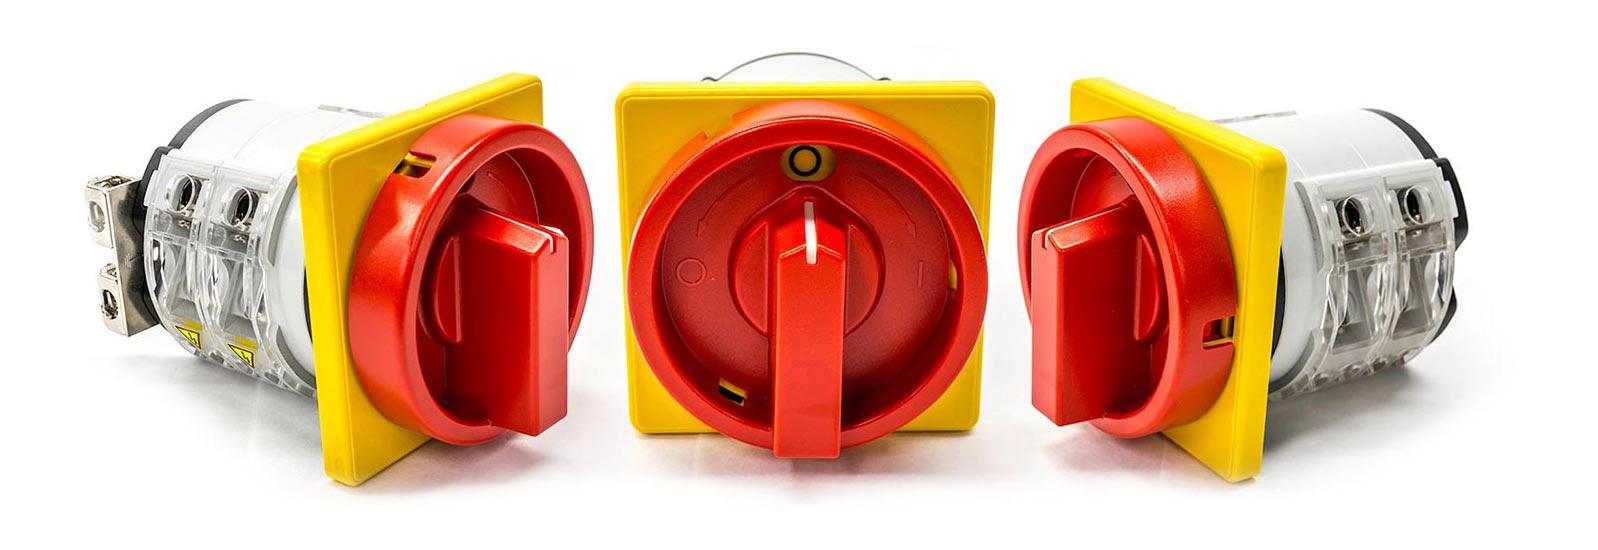 Multivac emergency stop switch